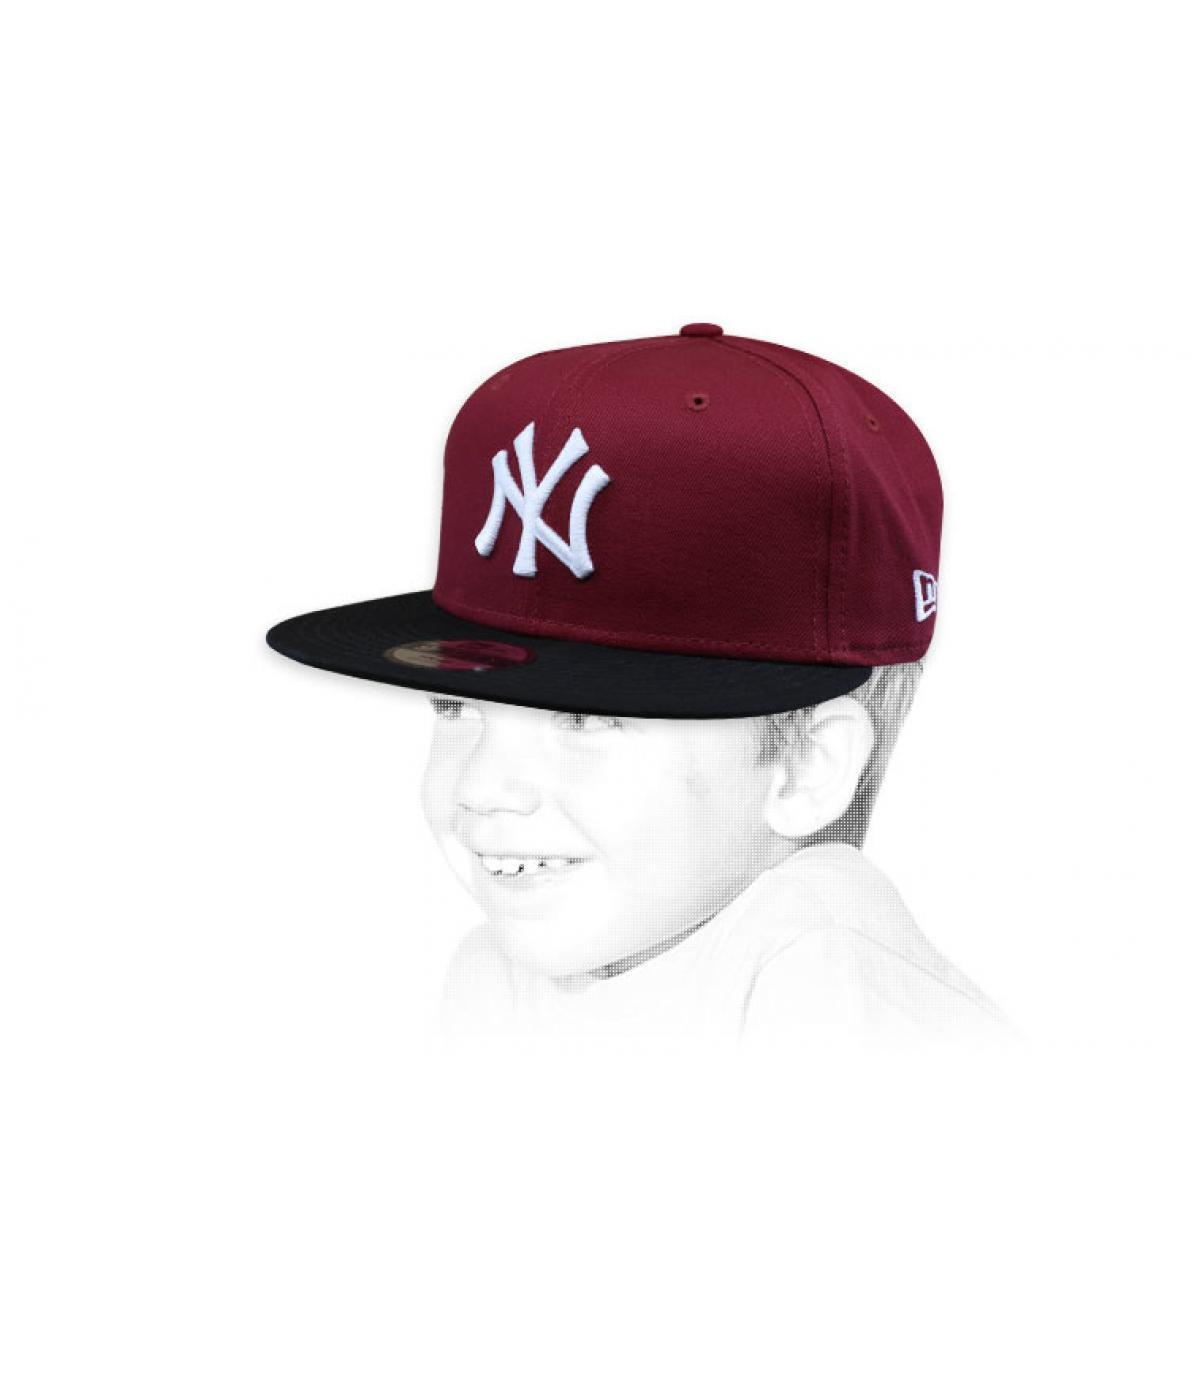 kindermuts NY bordeaux zwart